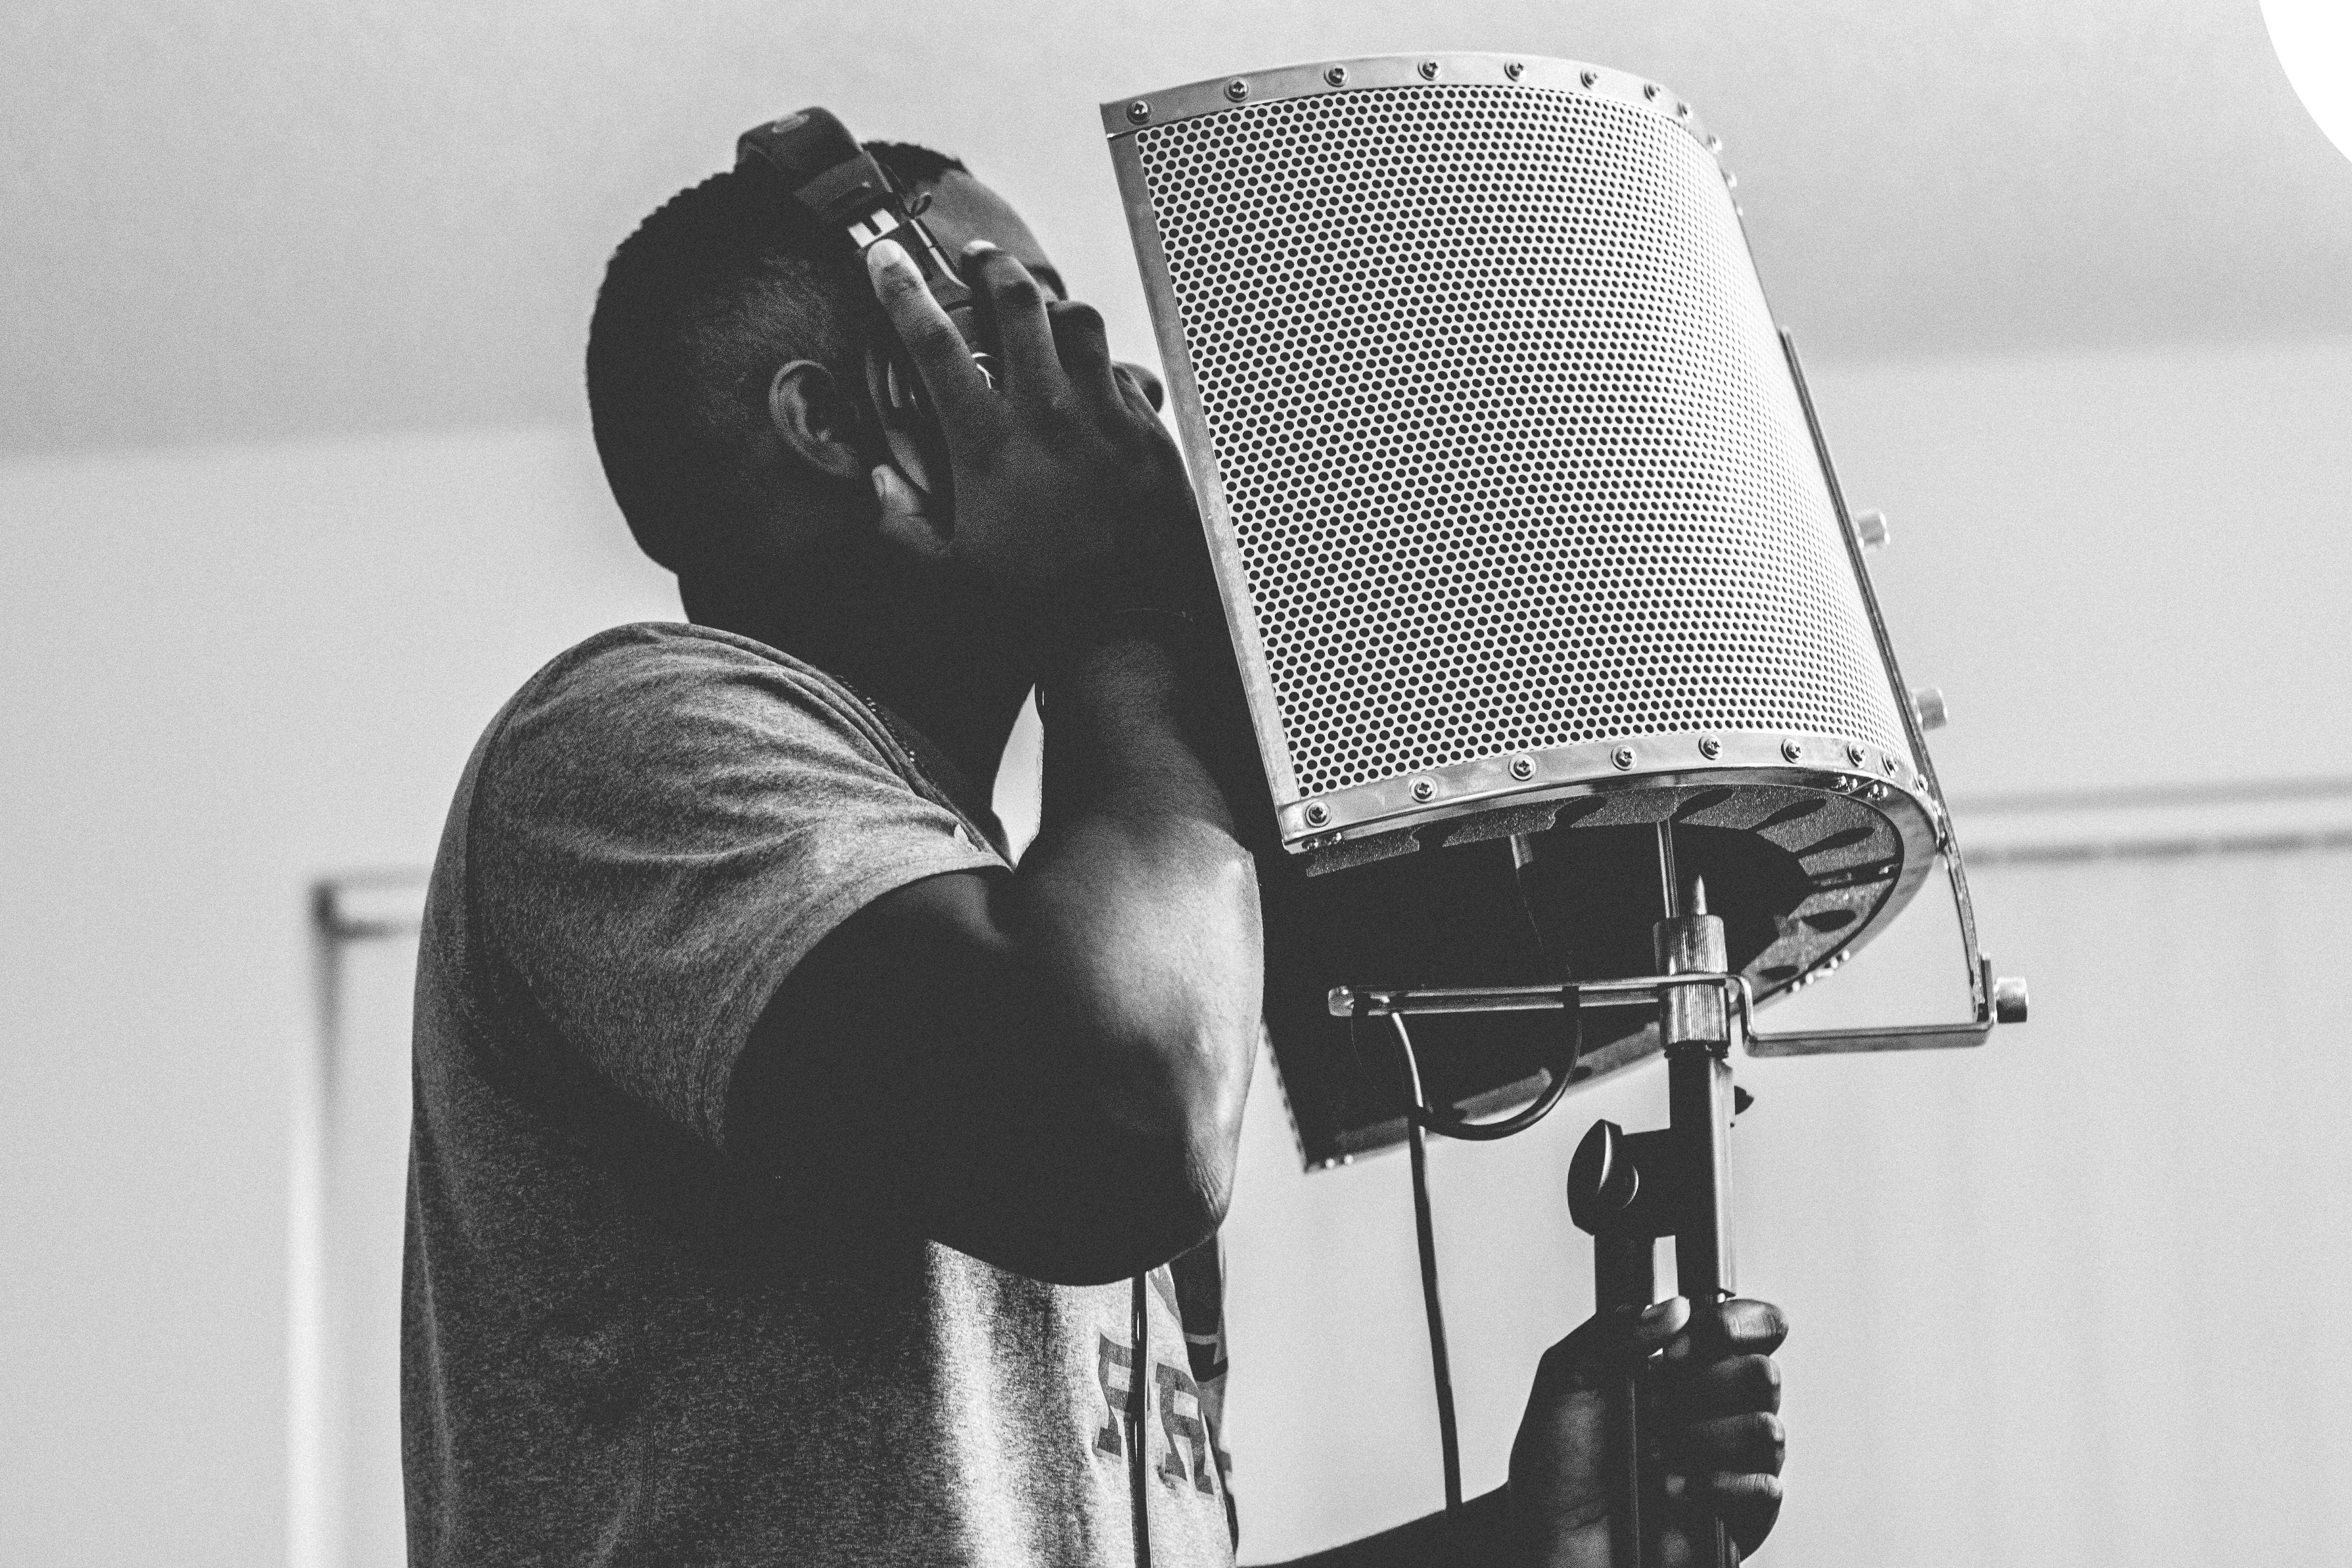 man wearing headphones while singing in front of microphone inside studio